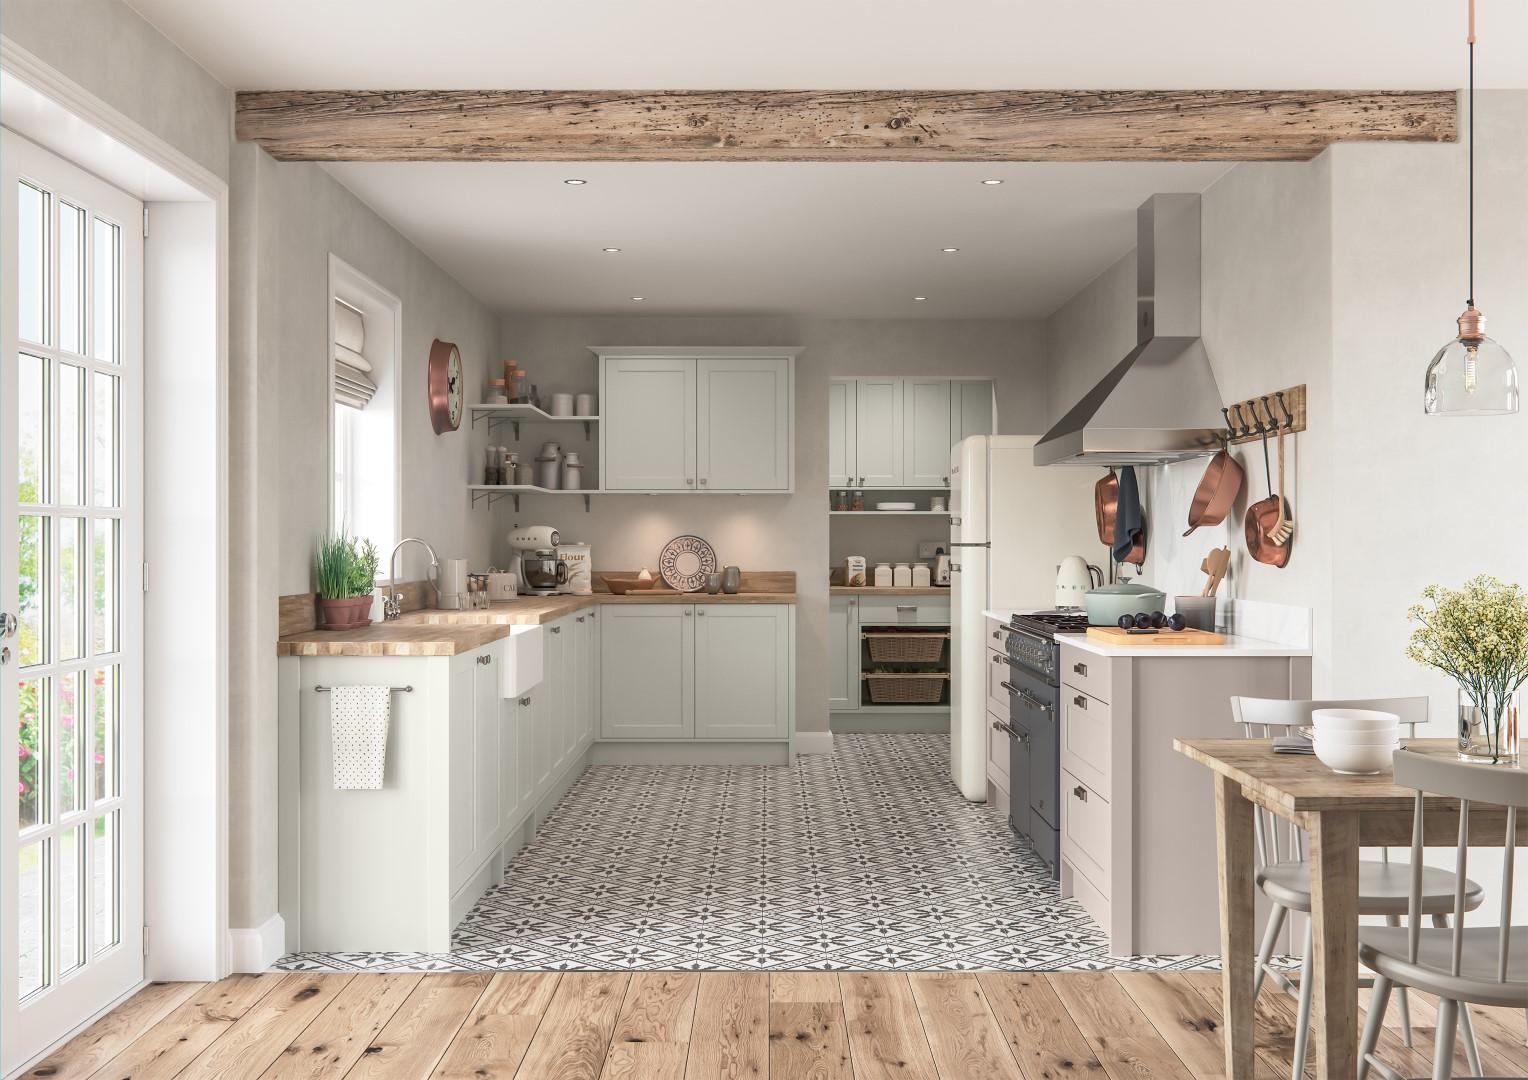 Dawson Porcelain and Cashmere - Kitchen Design - Alan Kelly Kitchens - Waterford - 5